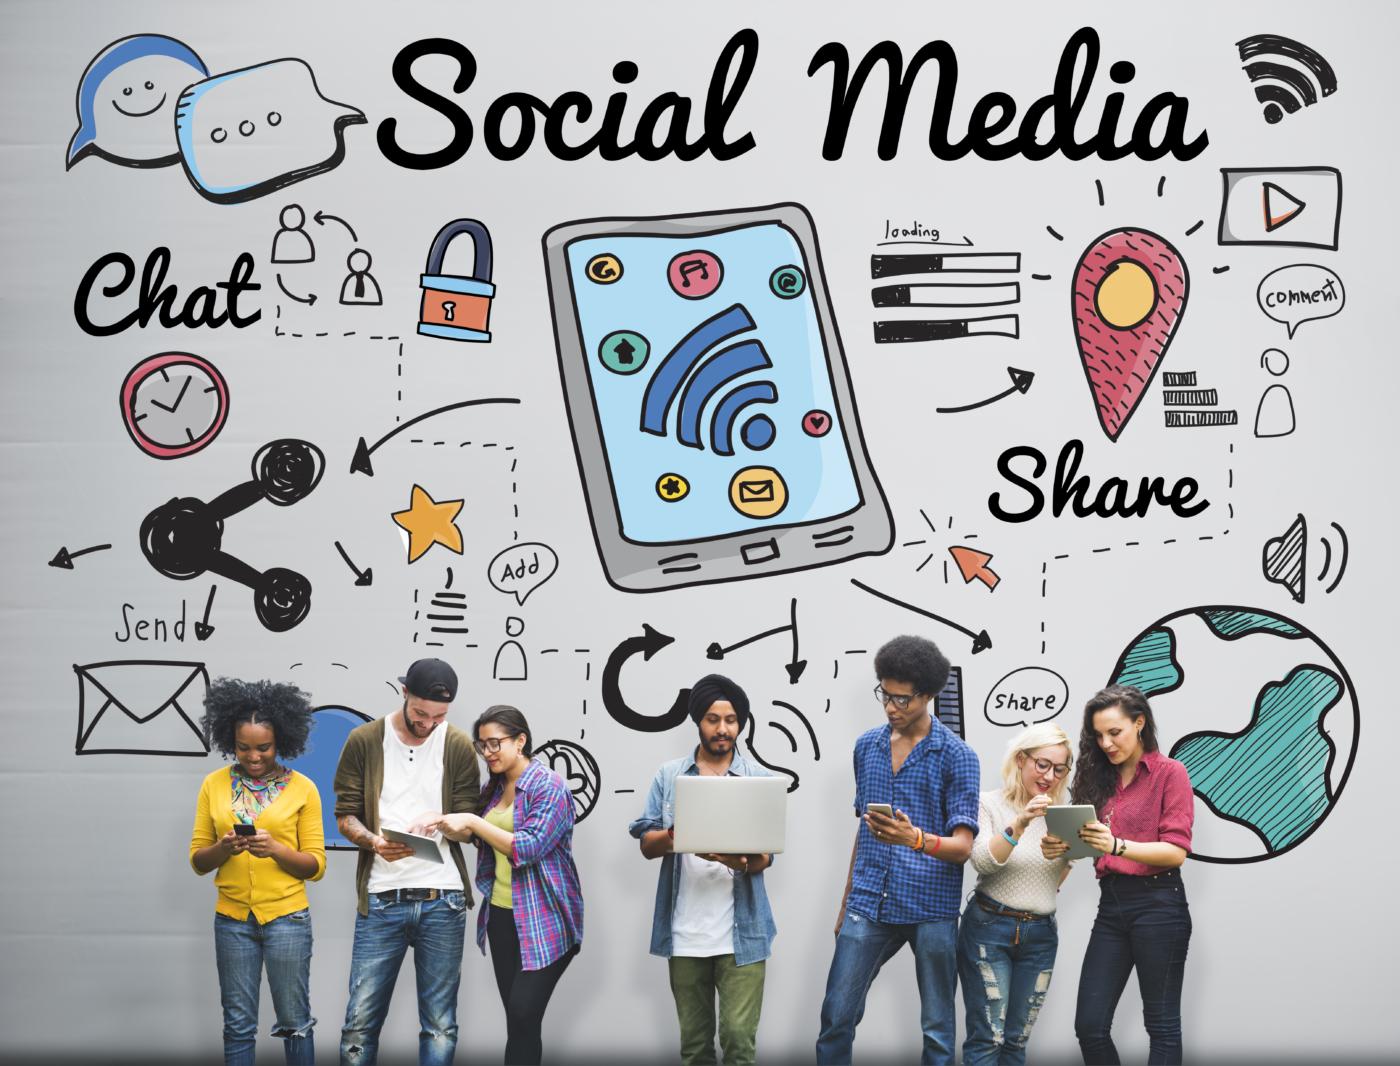 Social Media Chat Share Global Communication Concept